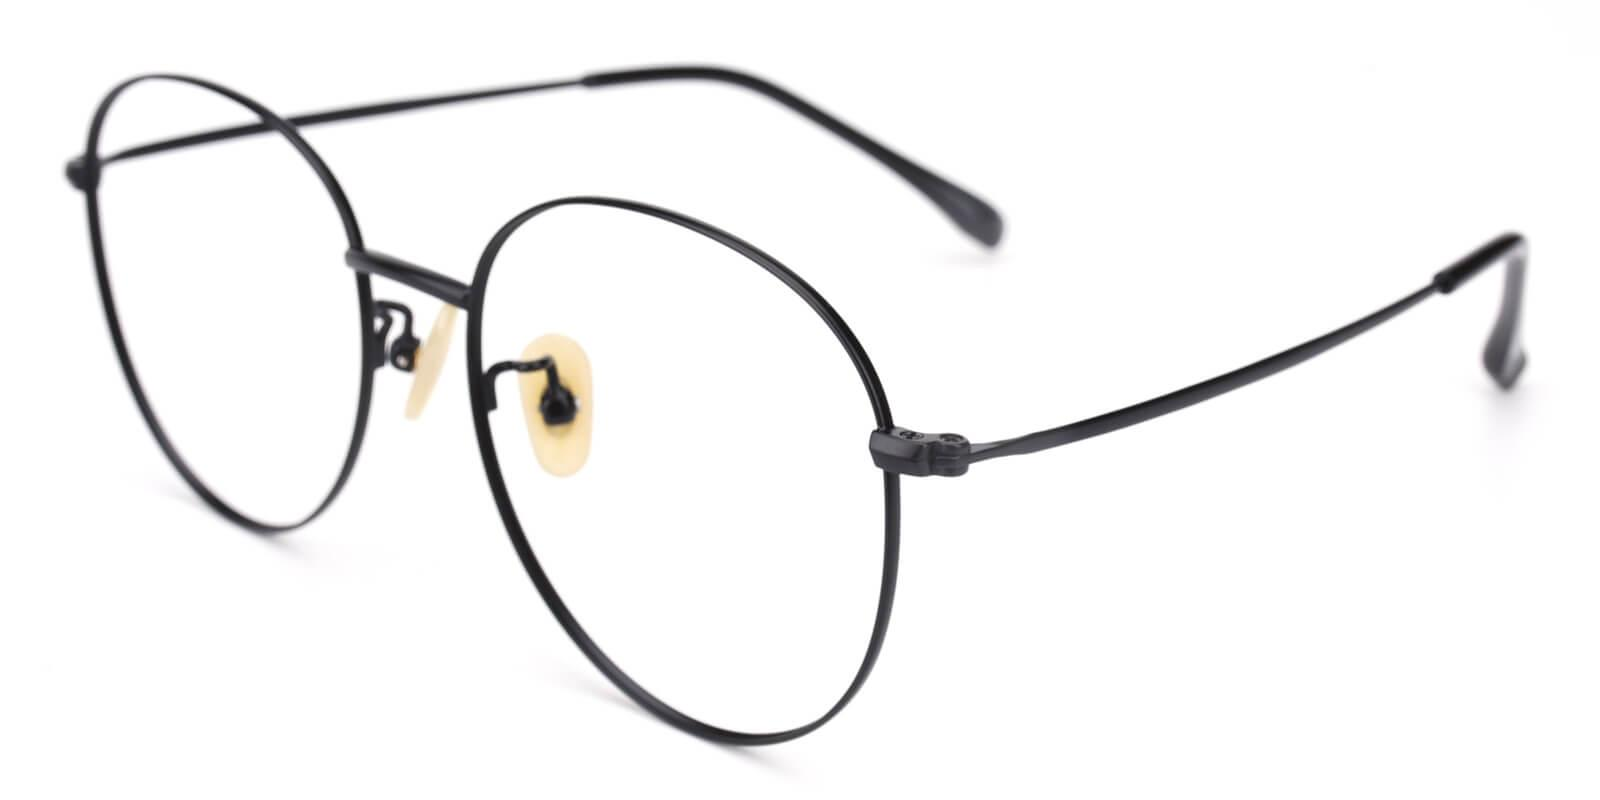 Mondigo-Black-Round-Titanium-Eyeglasses-additional1